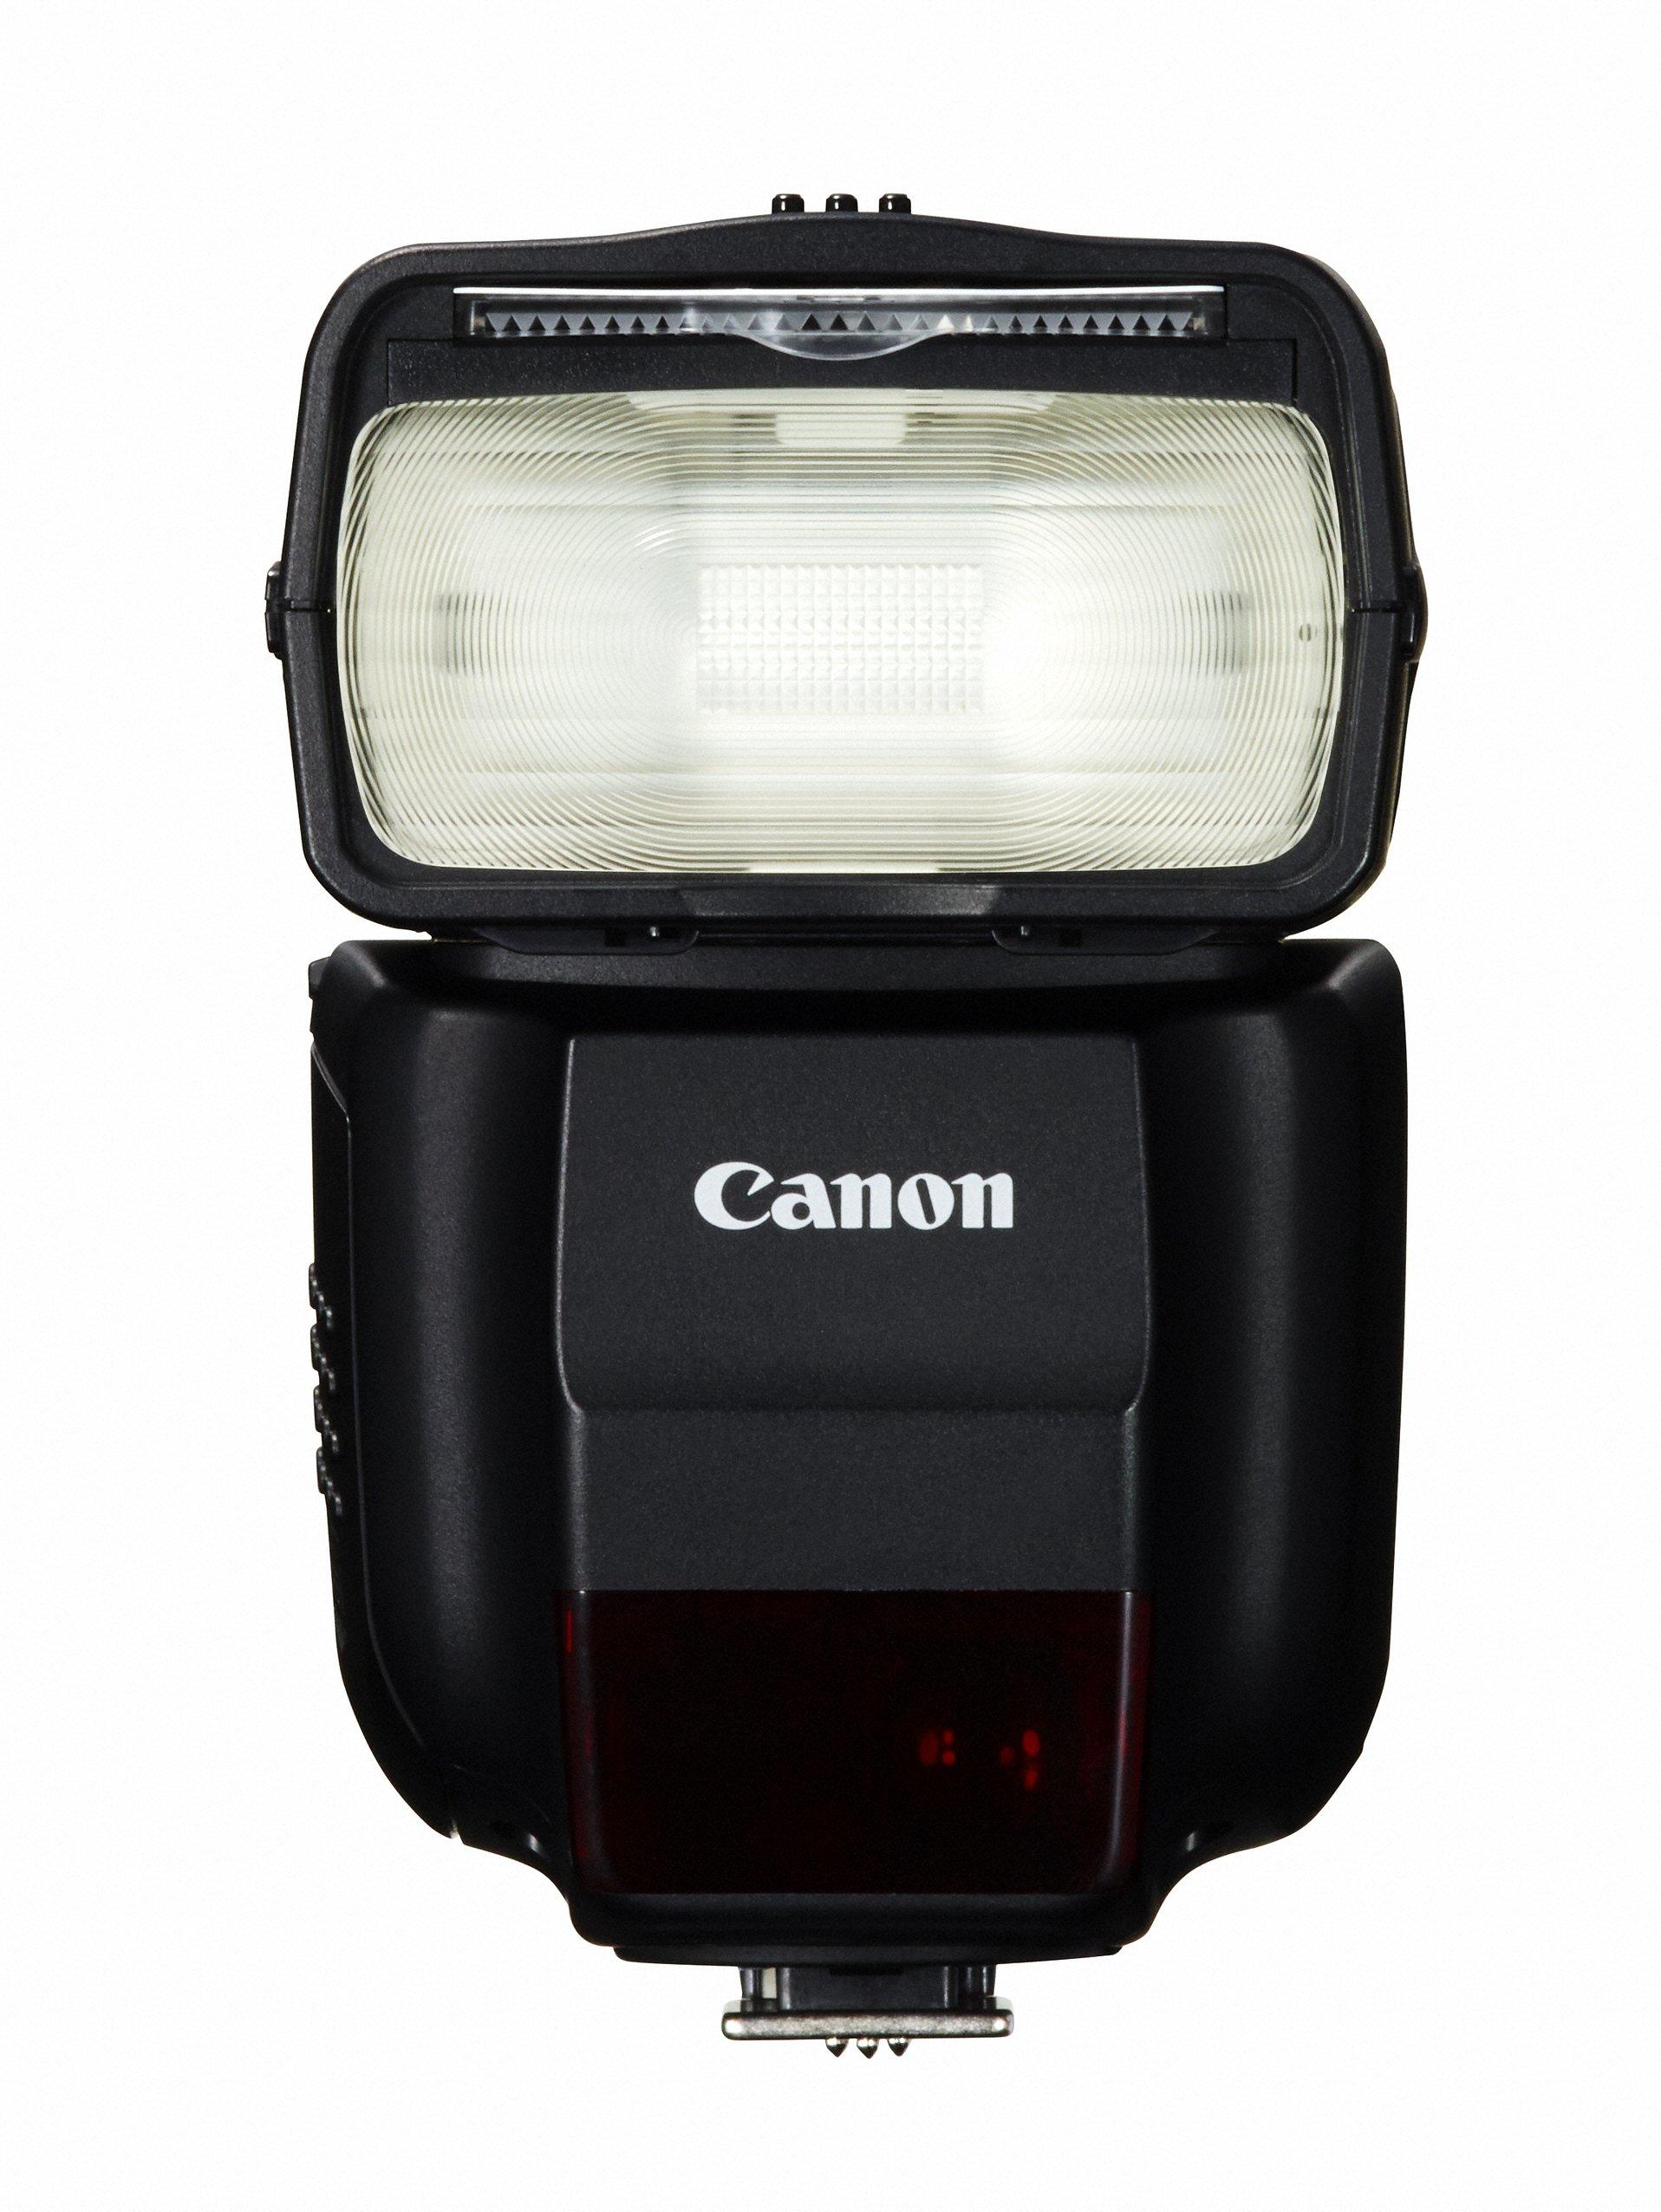 Canon Speedlite 430EX III-RT Flash by Canon